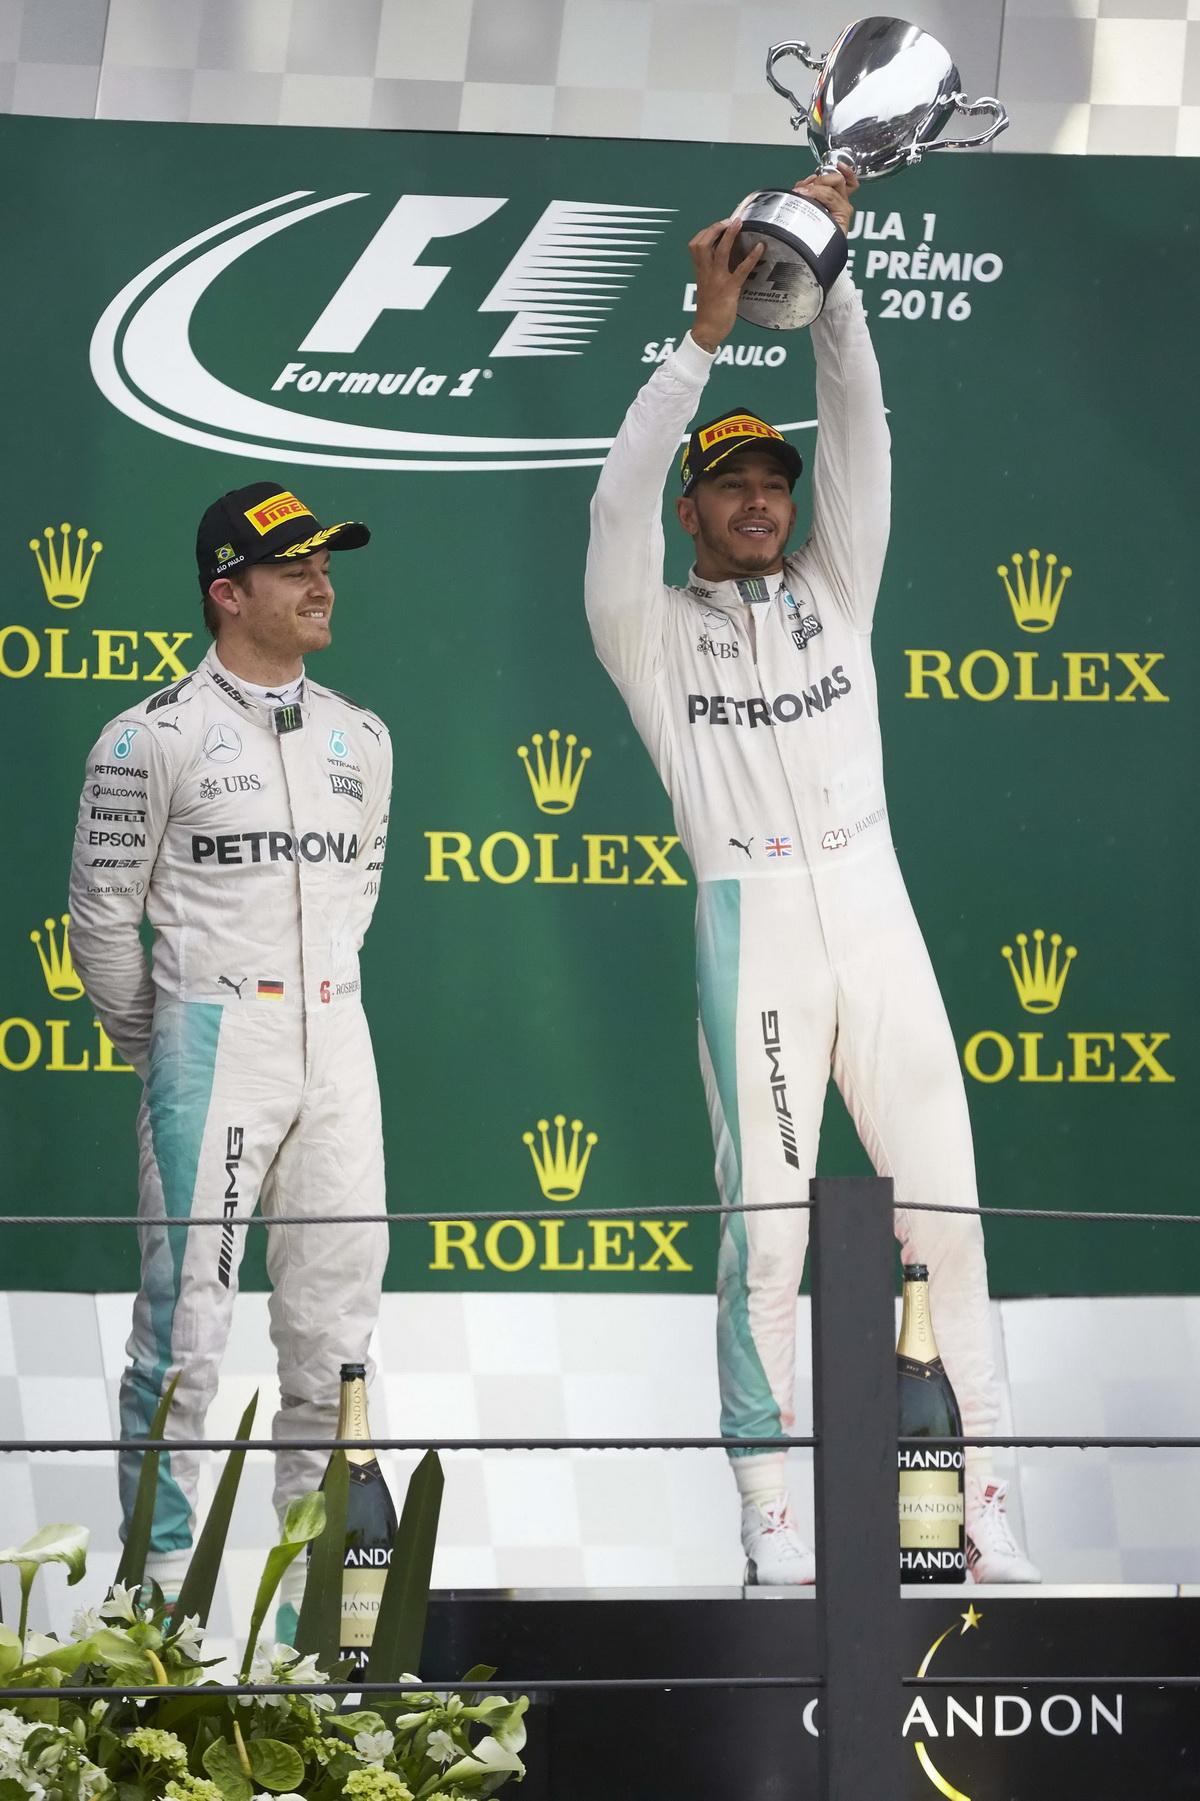 Lewis Hamilton與Nico Rosberg於巴西戰結束後,兩者積分縮短至12分,最後年度車手冠軍鹿死誰手,最終站阿布達比站才將分出勝負!.jpg